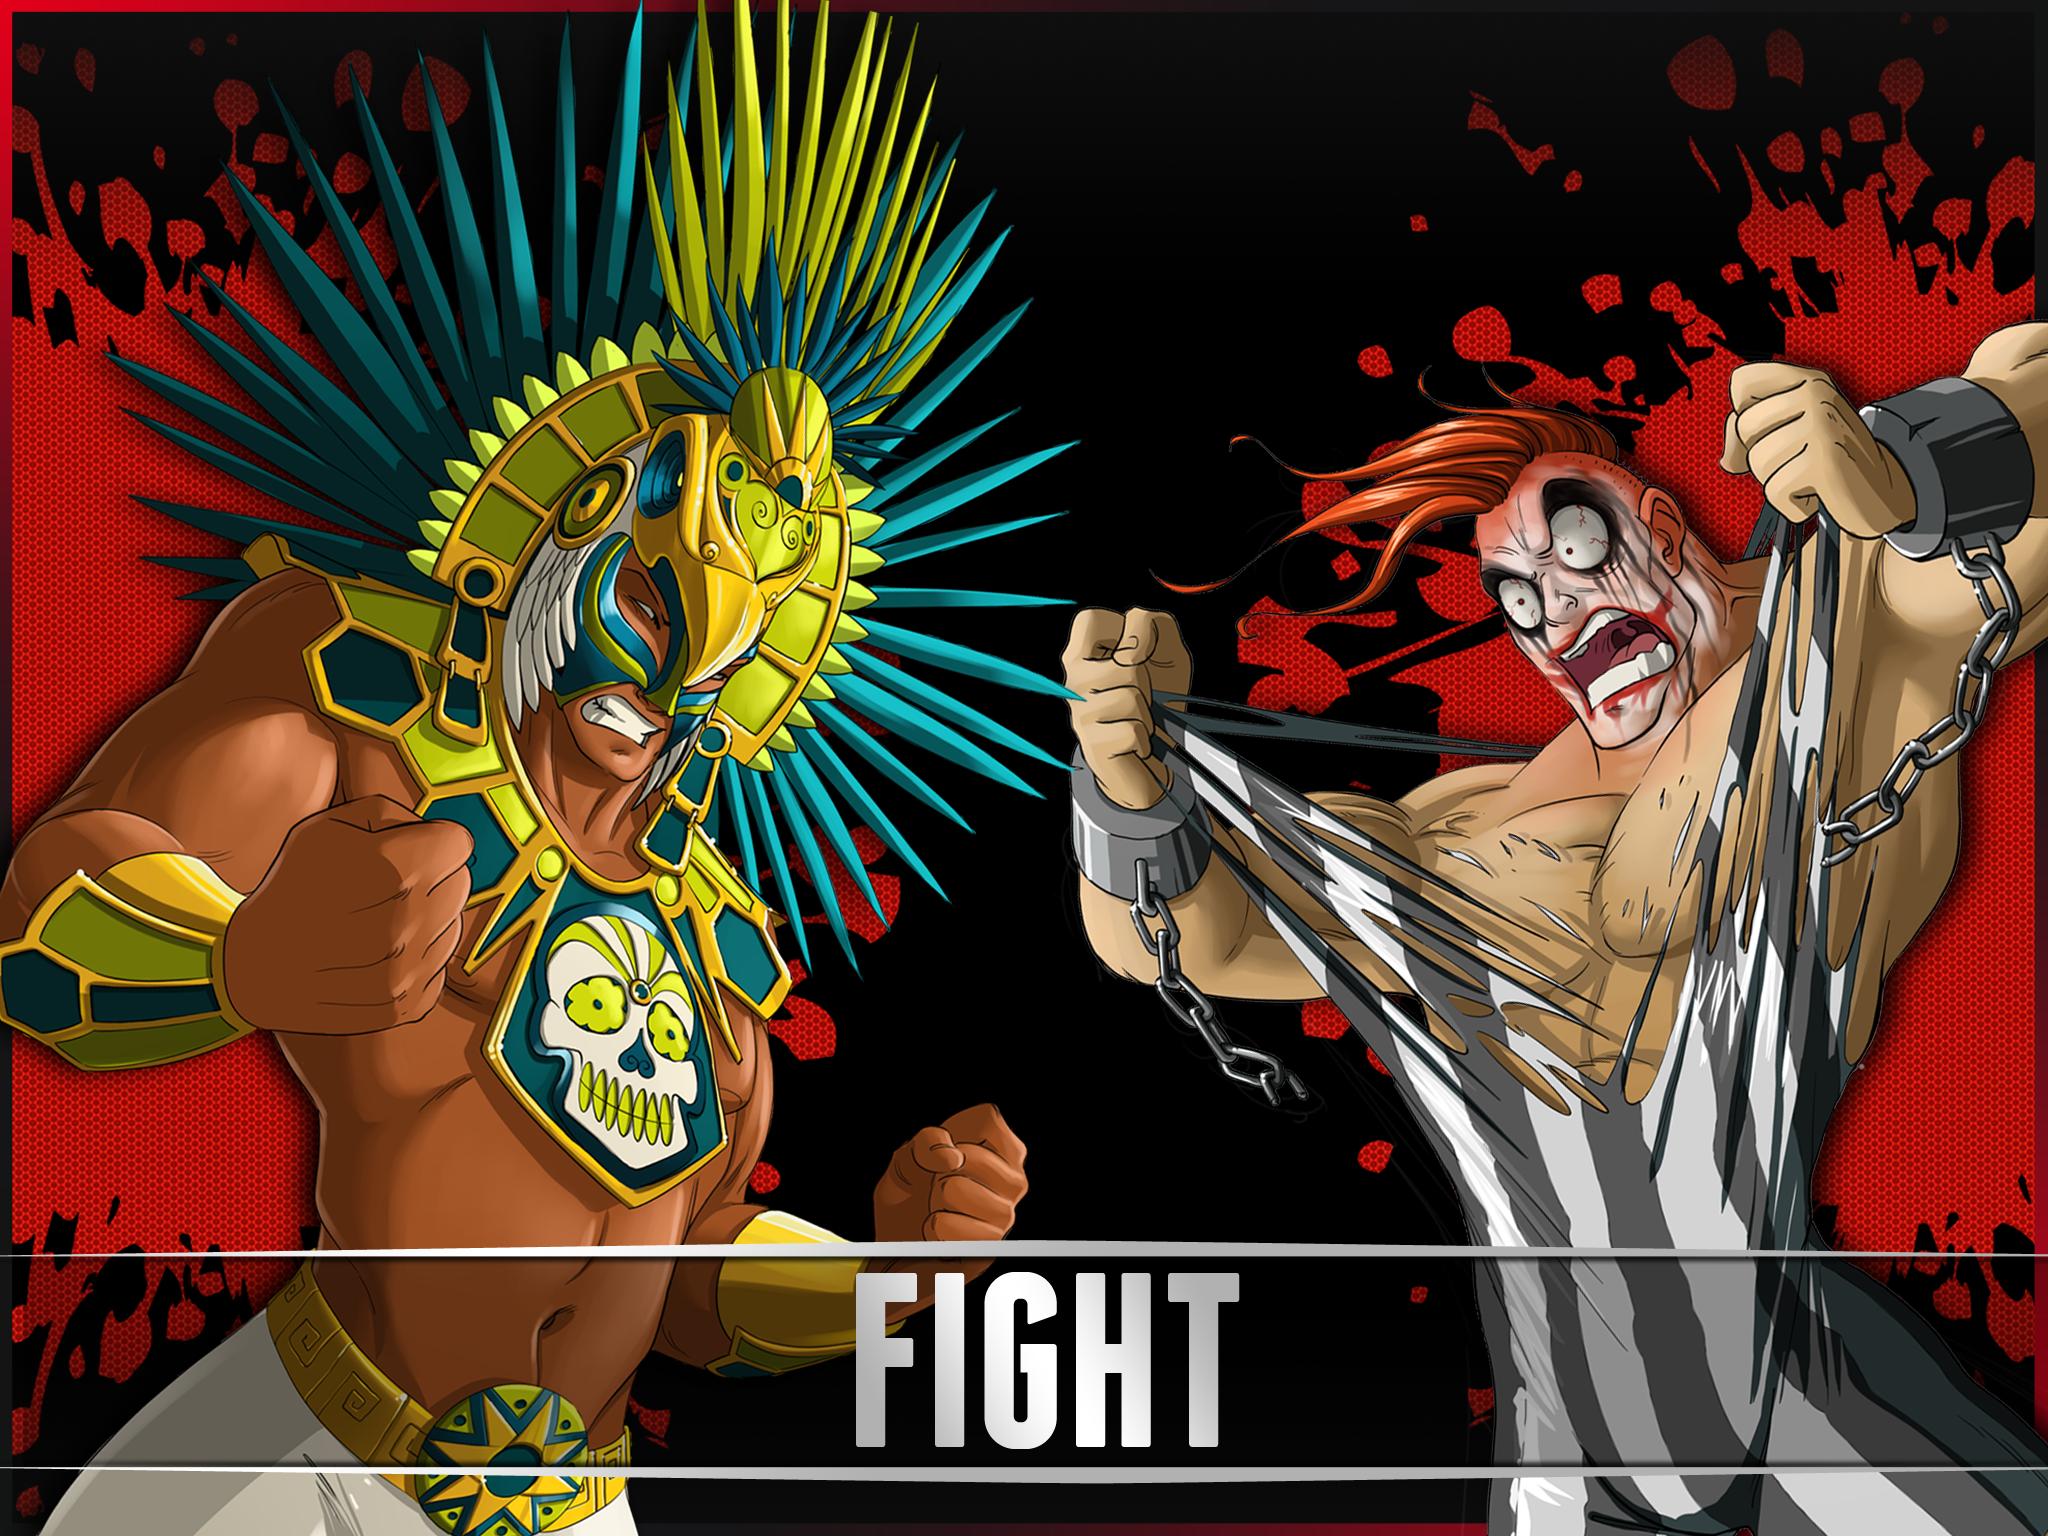 http://img.appular.com.s3.amazonaws.com/Wrestling%20Storm%20Screenshots/Wrestling%20Storm%20Screenshot%204.png